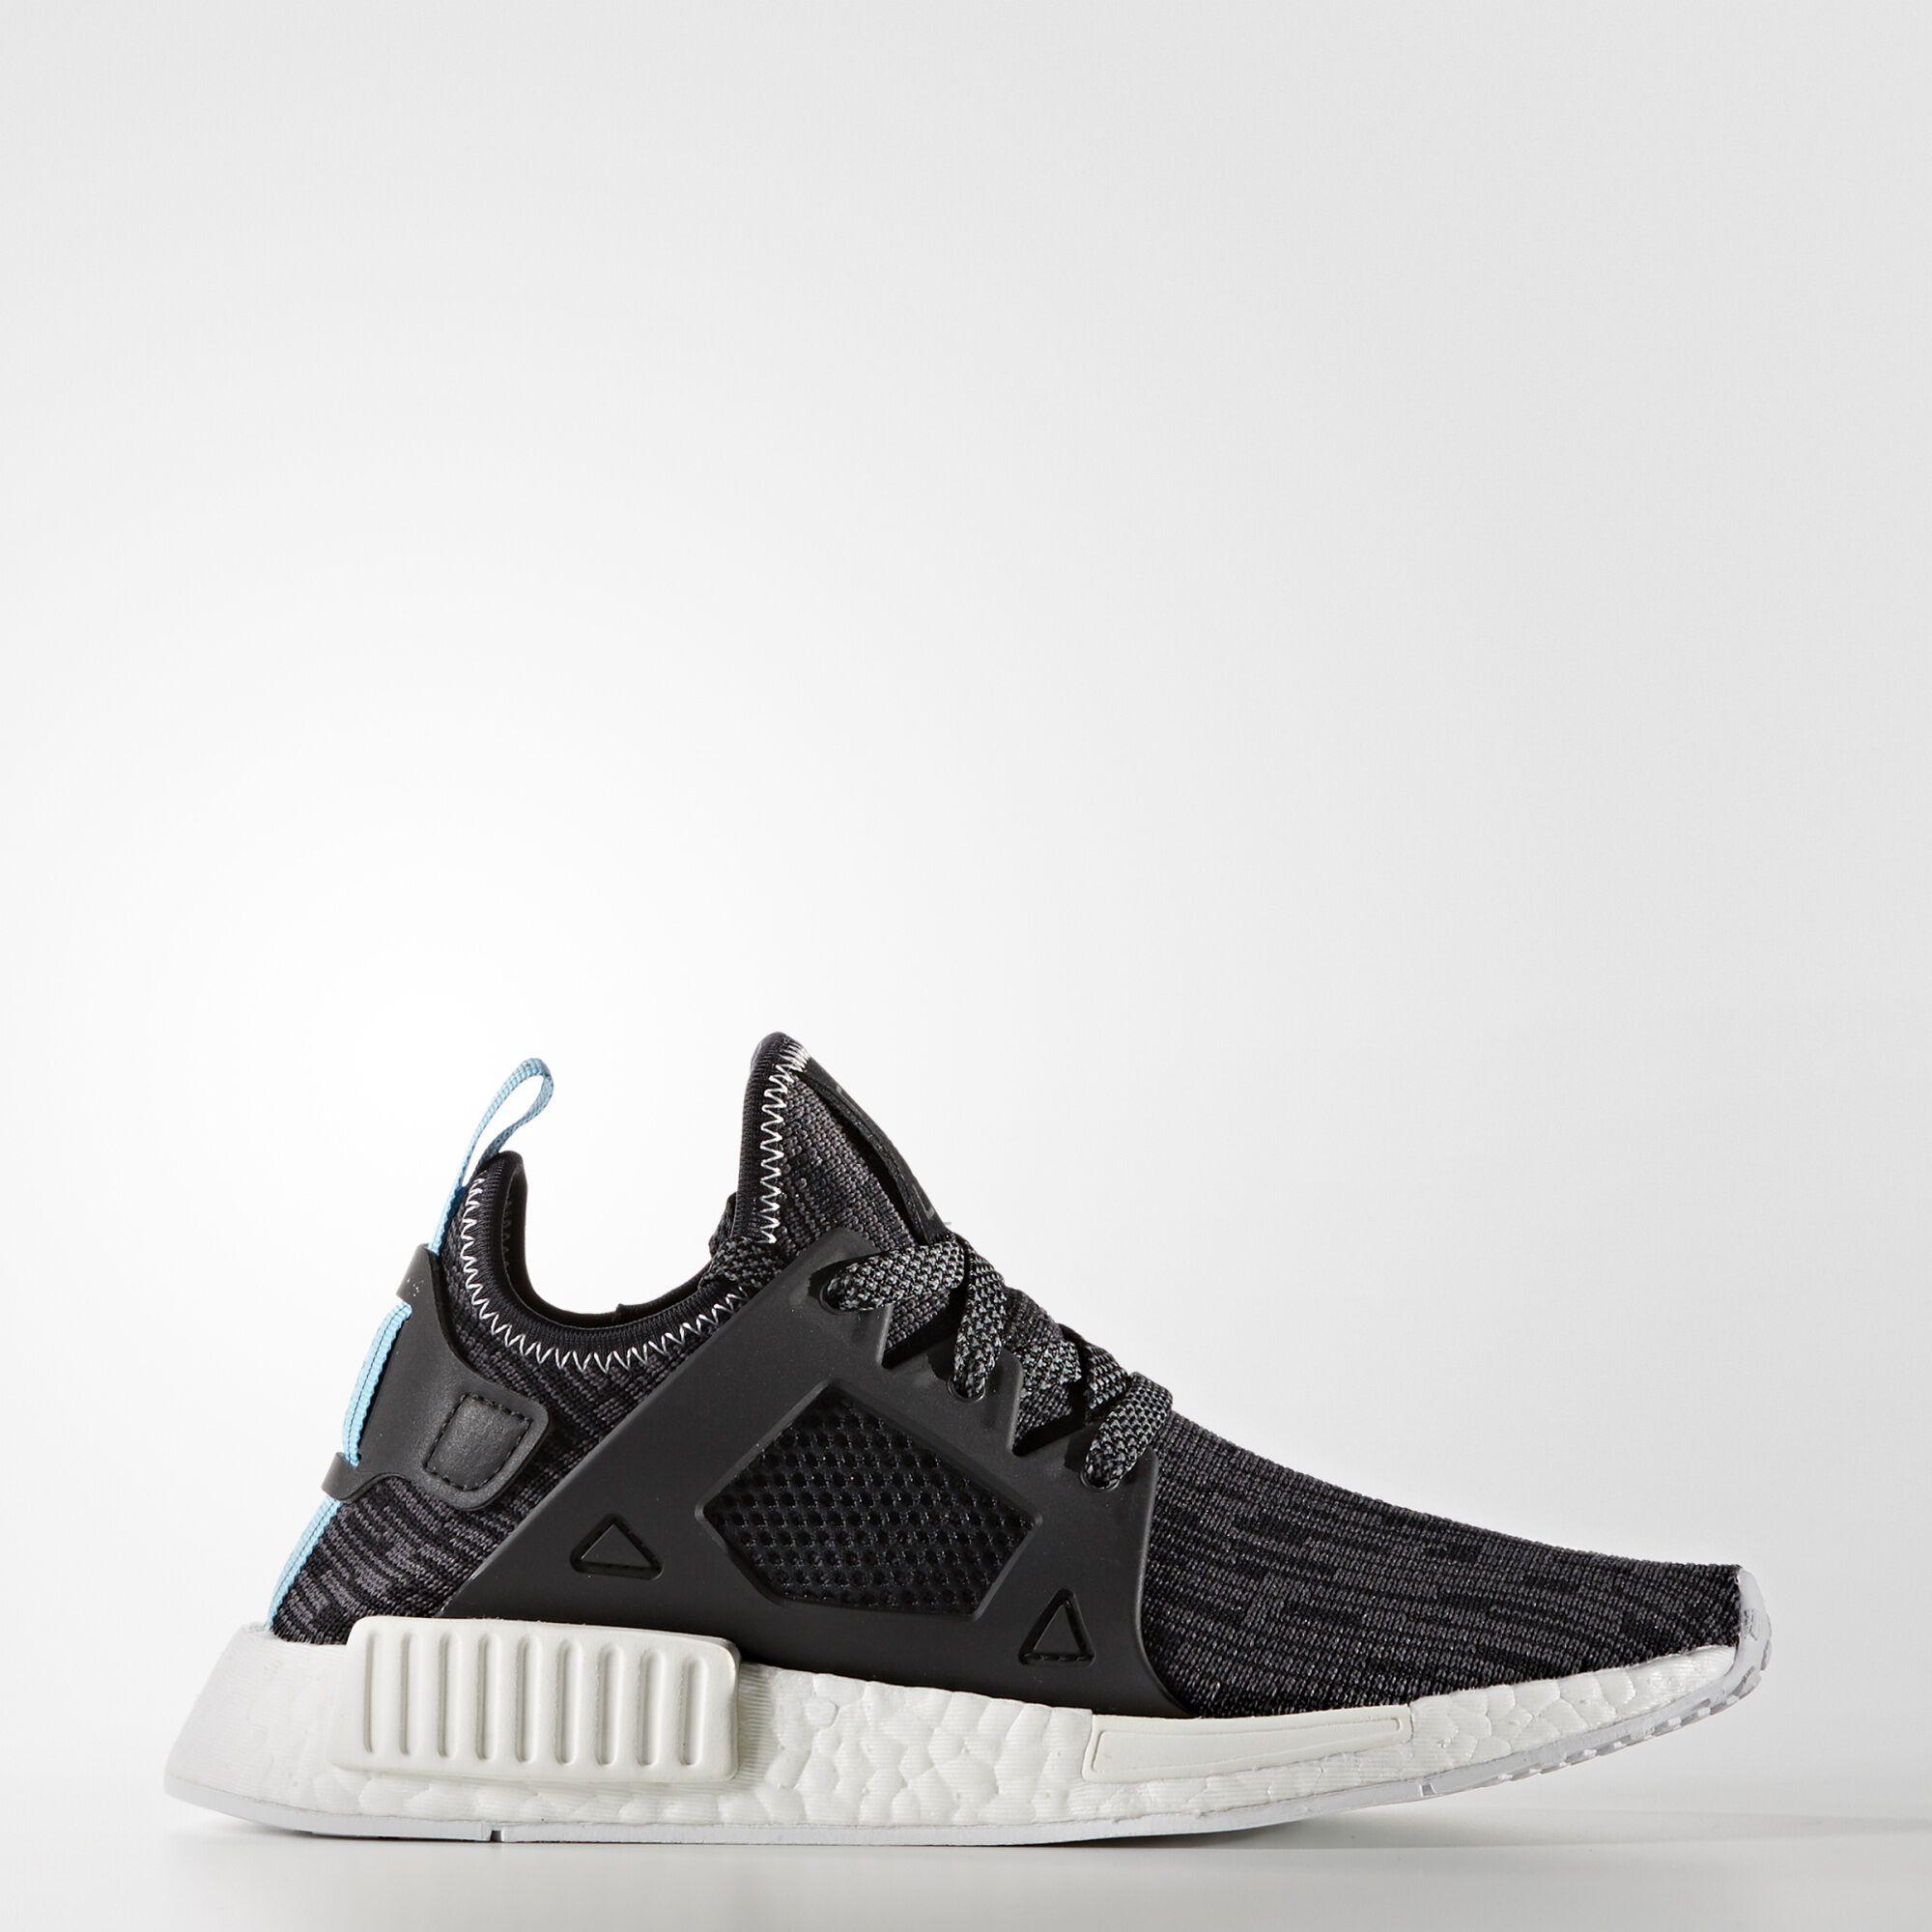 adidas nmd xr1 primeknit shoes black adidas us. Black Bedroom Furniture Sets. Home Design Ideas